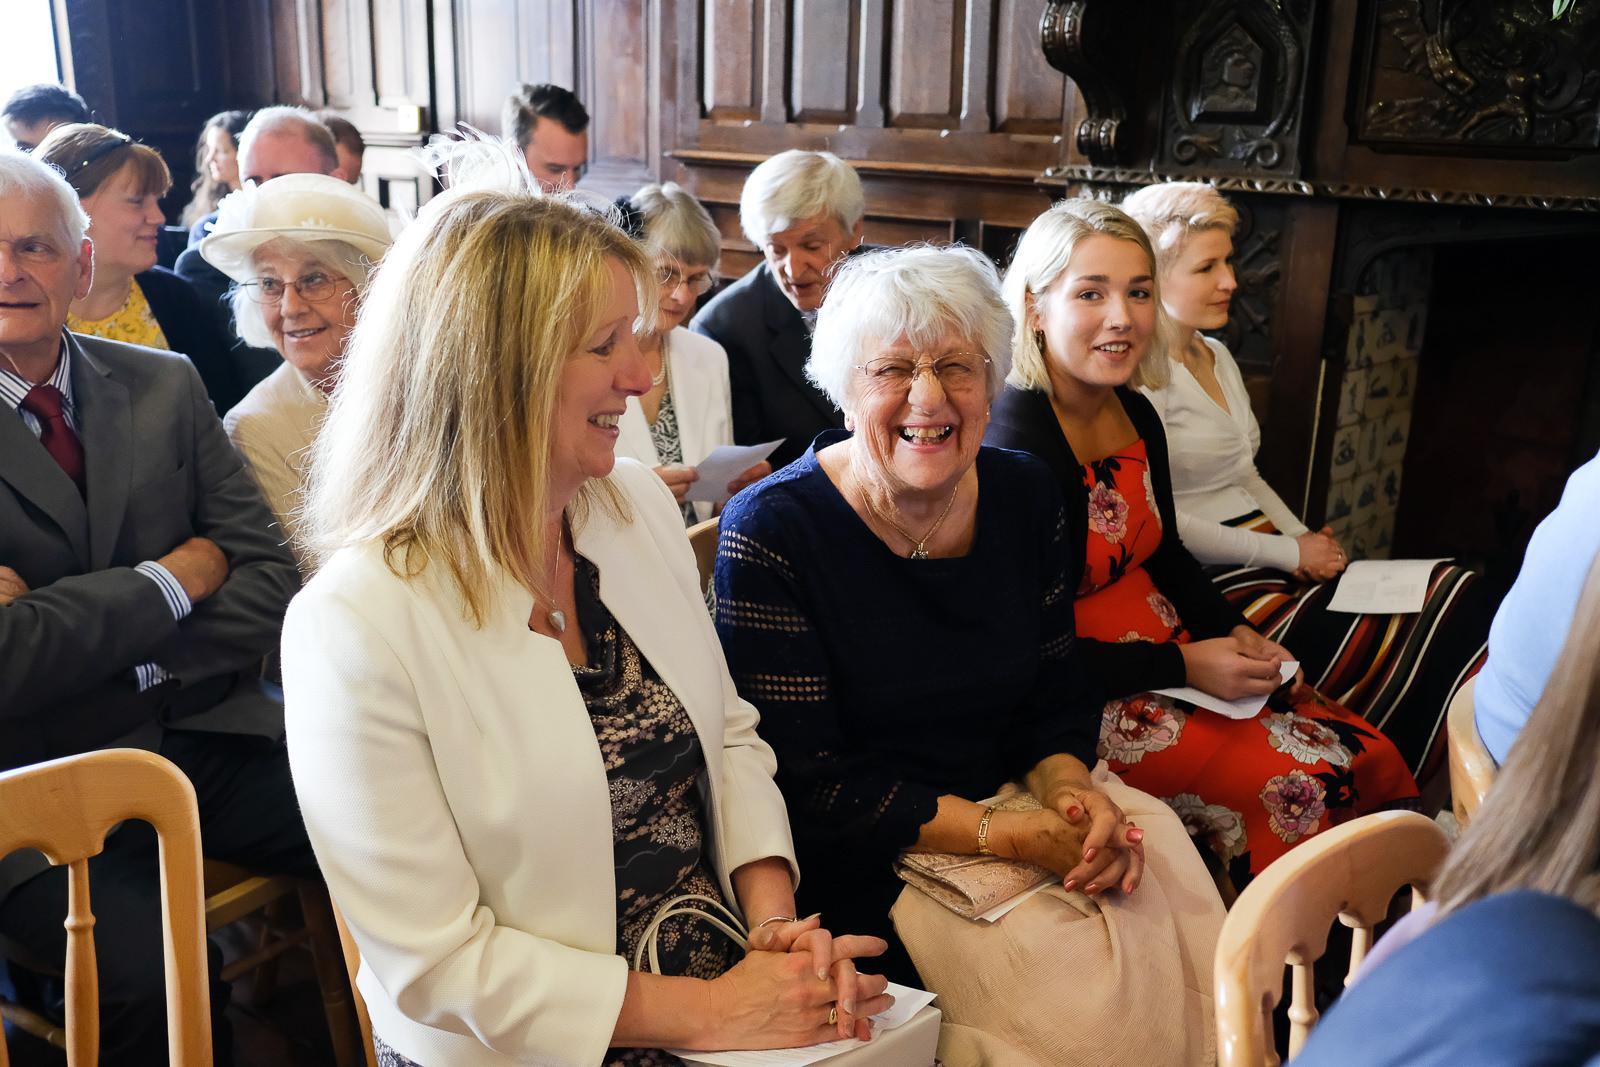 Tawstock Court Wedding_23.jpg